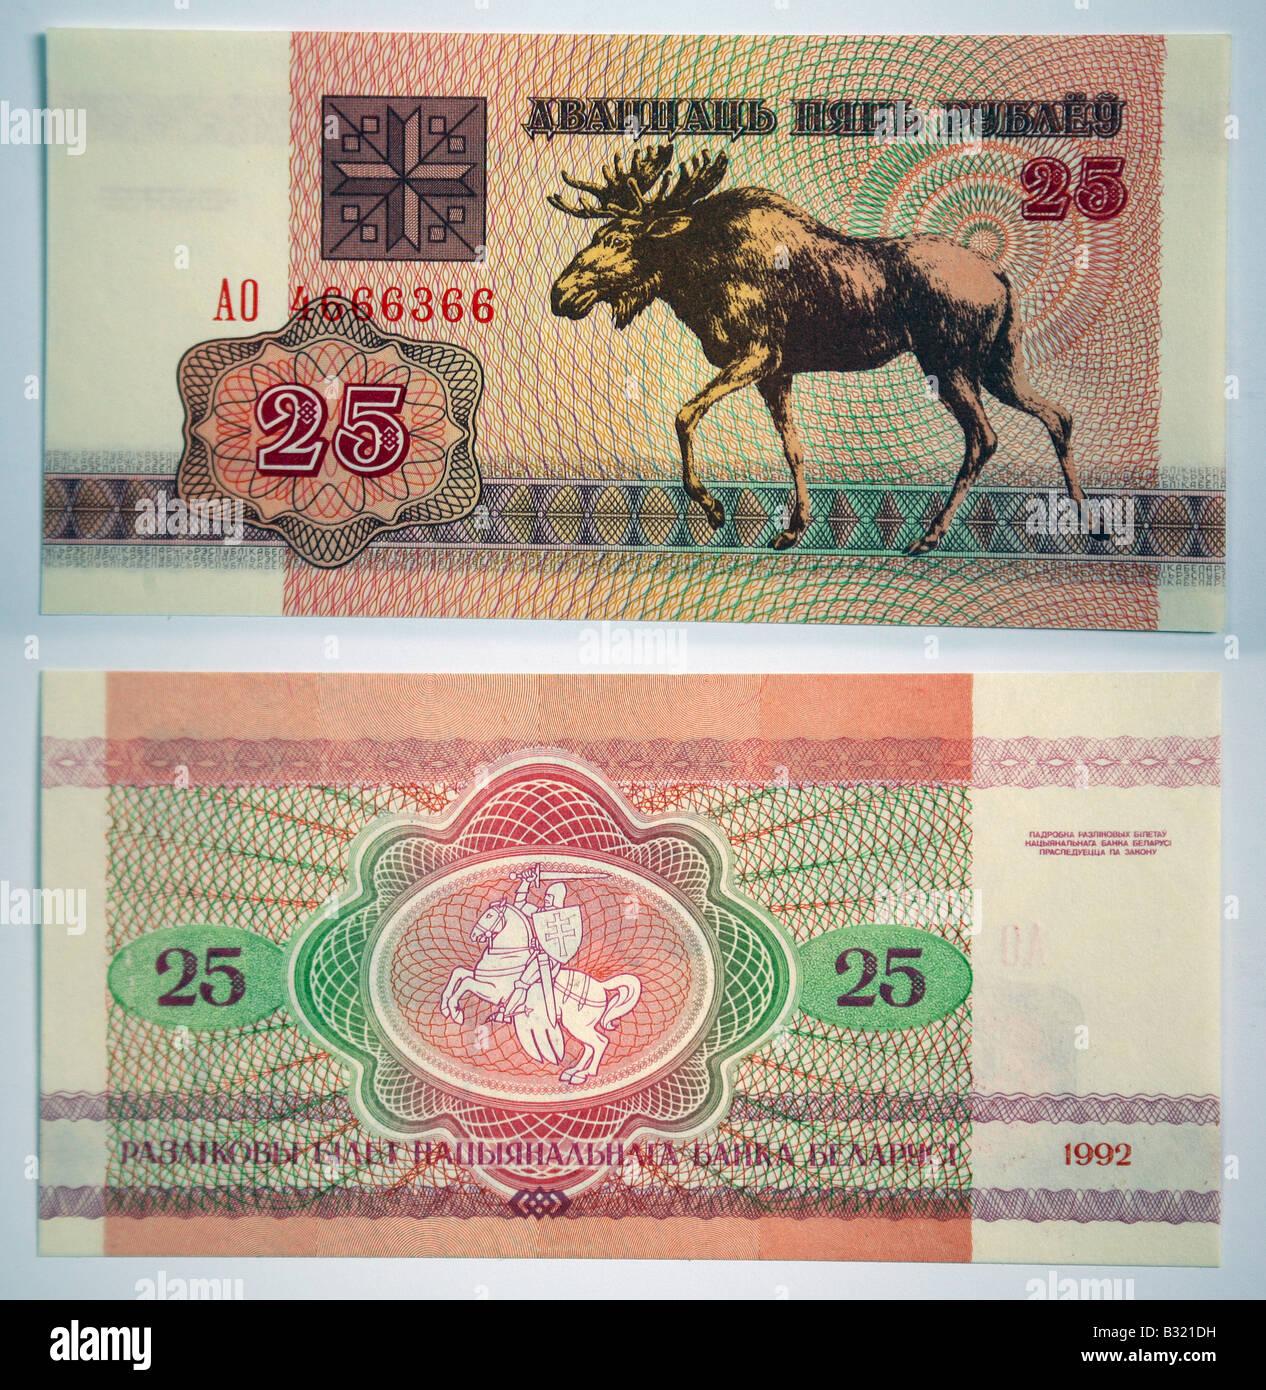 Belarus 25 Rublei UNC Banknote - Stock Image